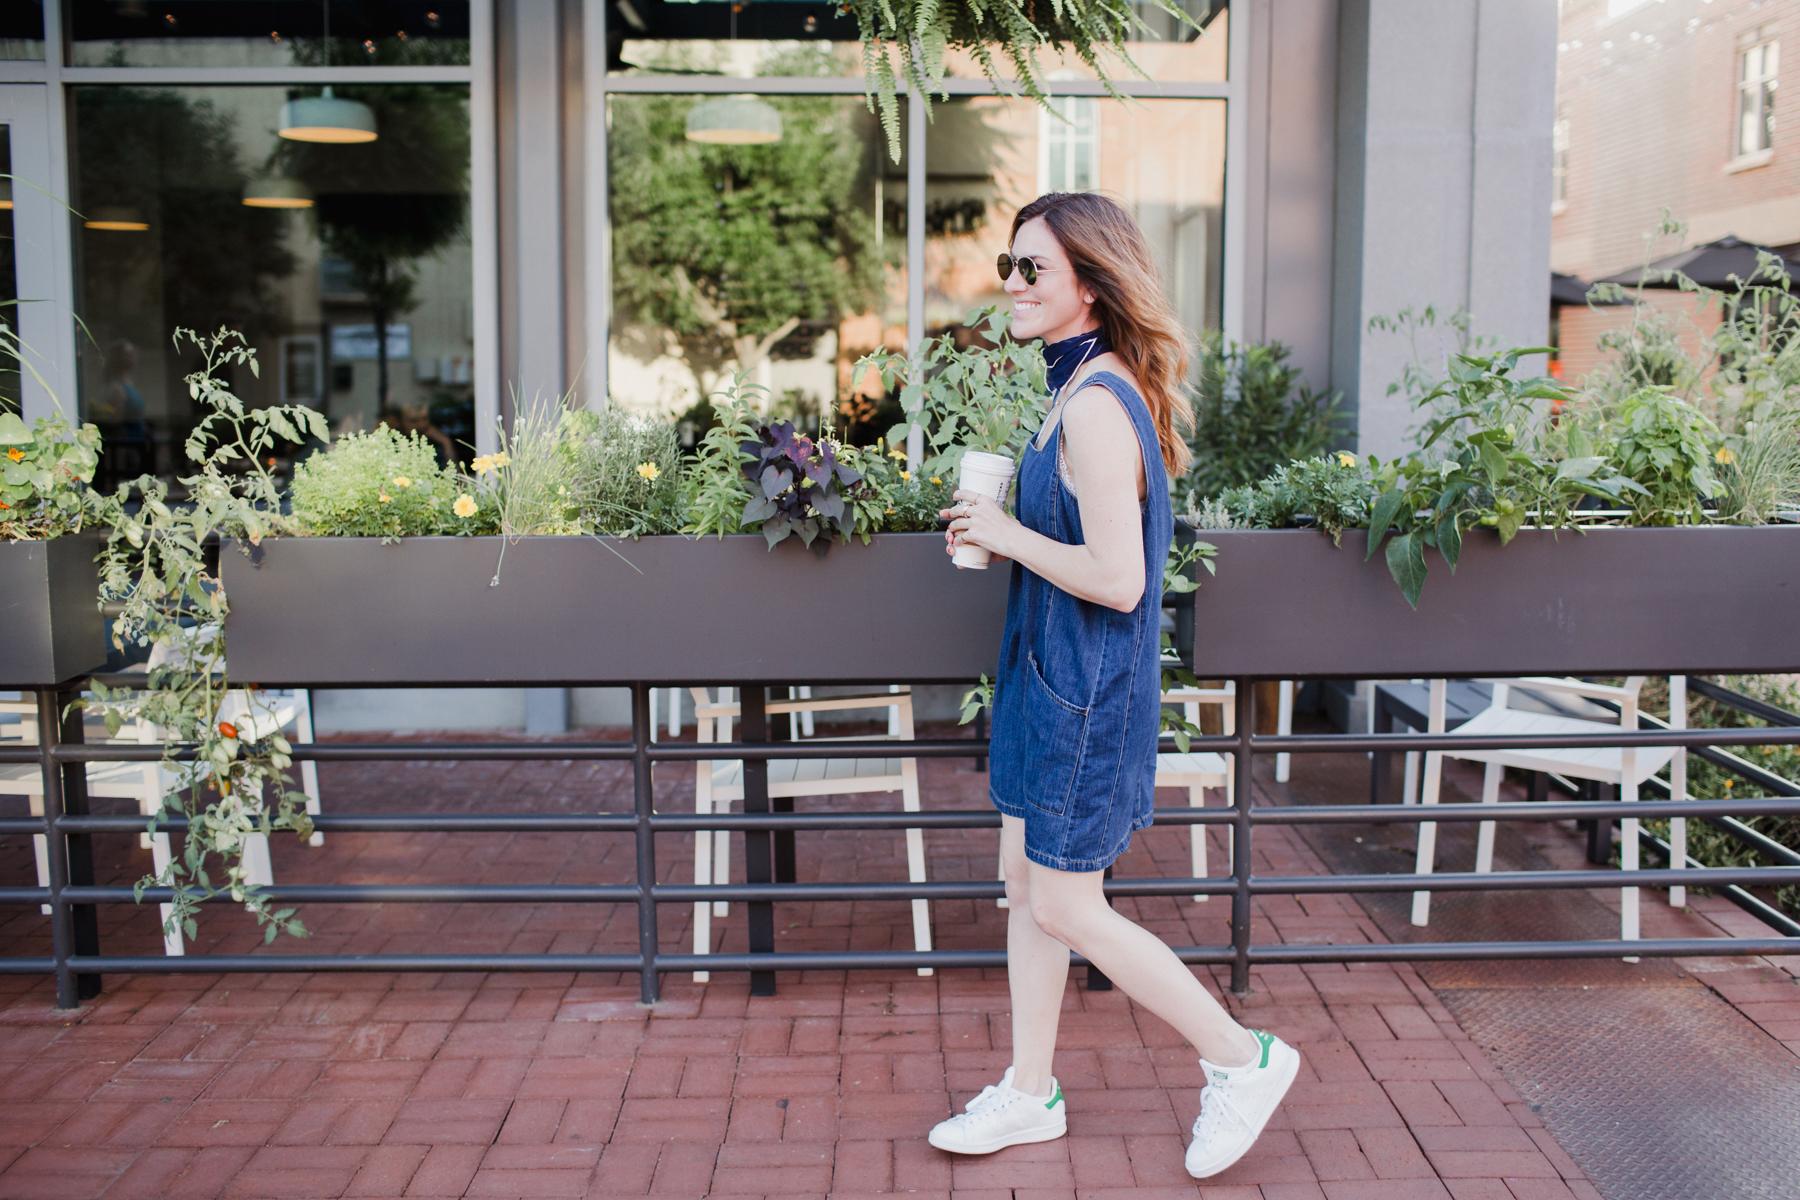 anna_e_cottrell_eldridge_edit_fashion_blogger_mgb_photo_denim_dress_summer_2016_trends_adidas_stan_smith_vintage_jewelry_acne_aviator_sunglasses_coffee_7.jpg